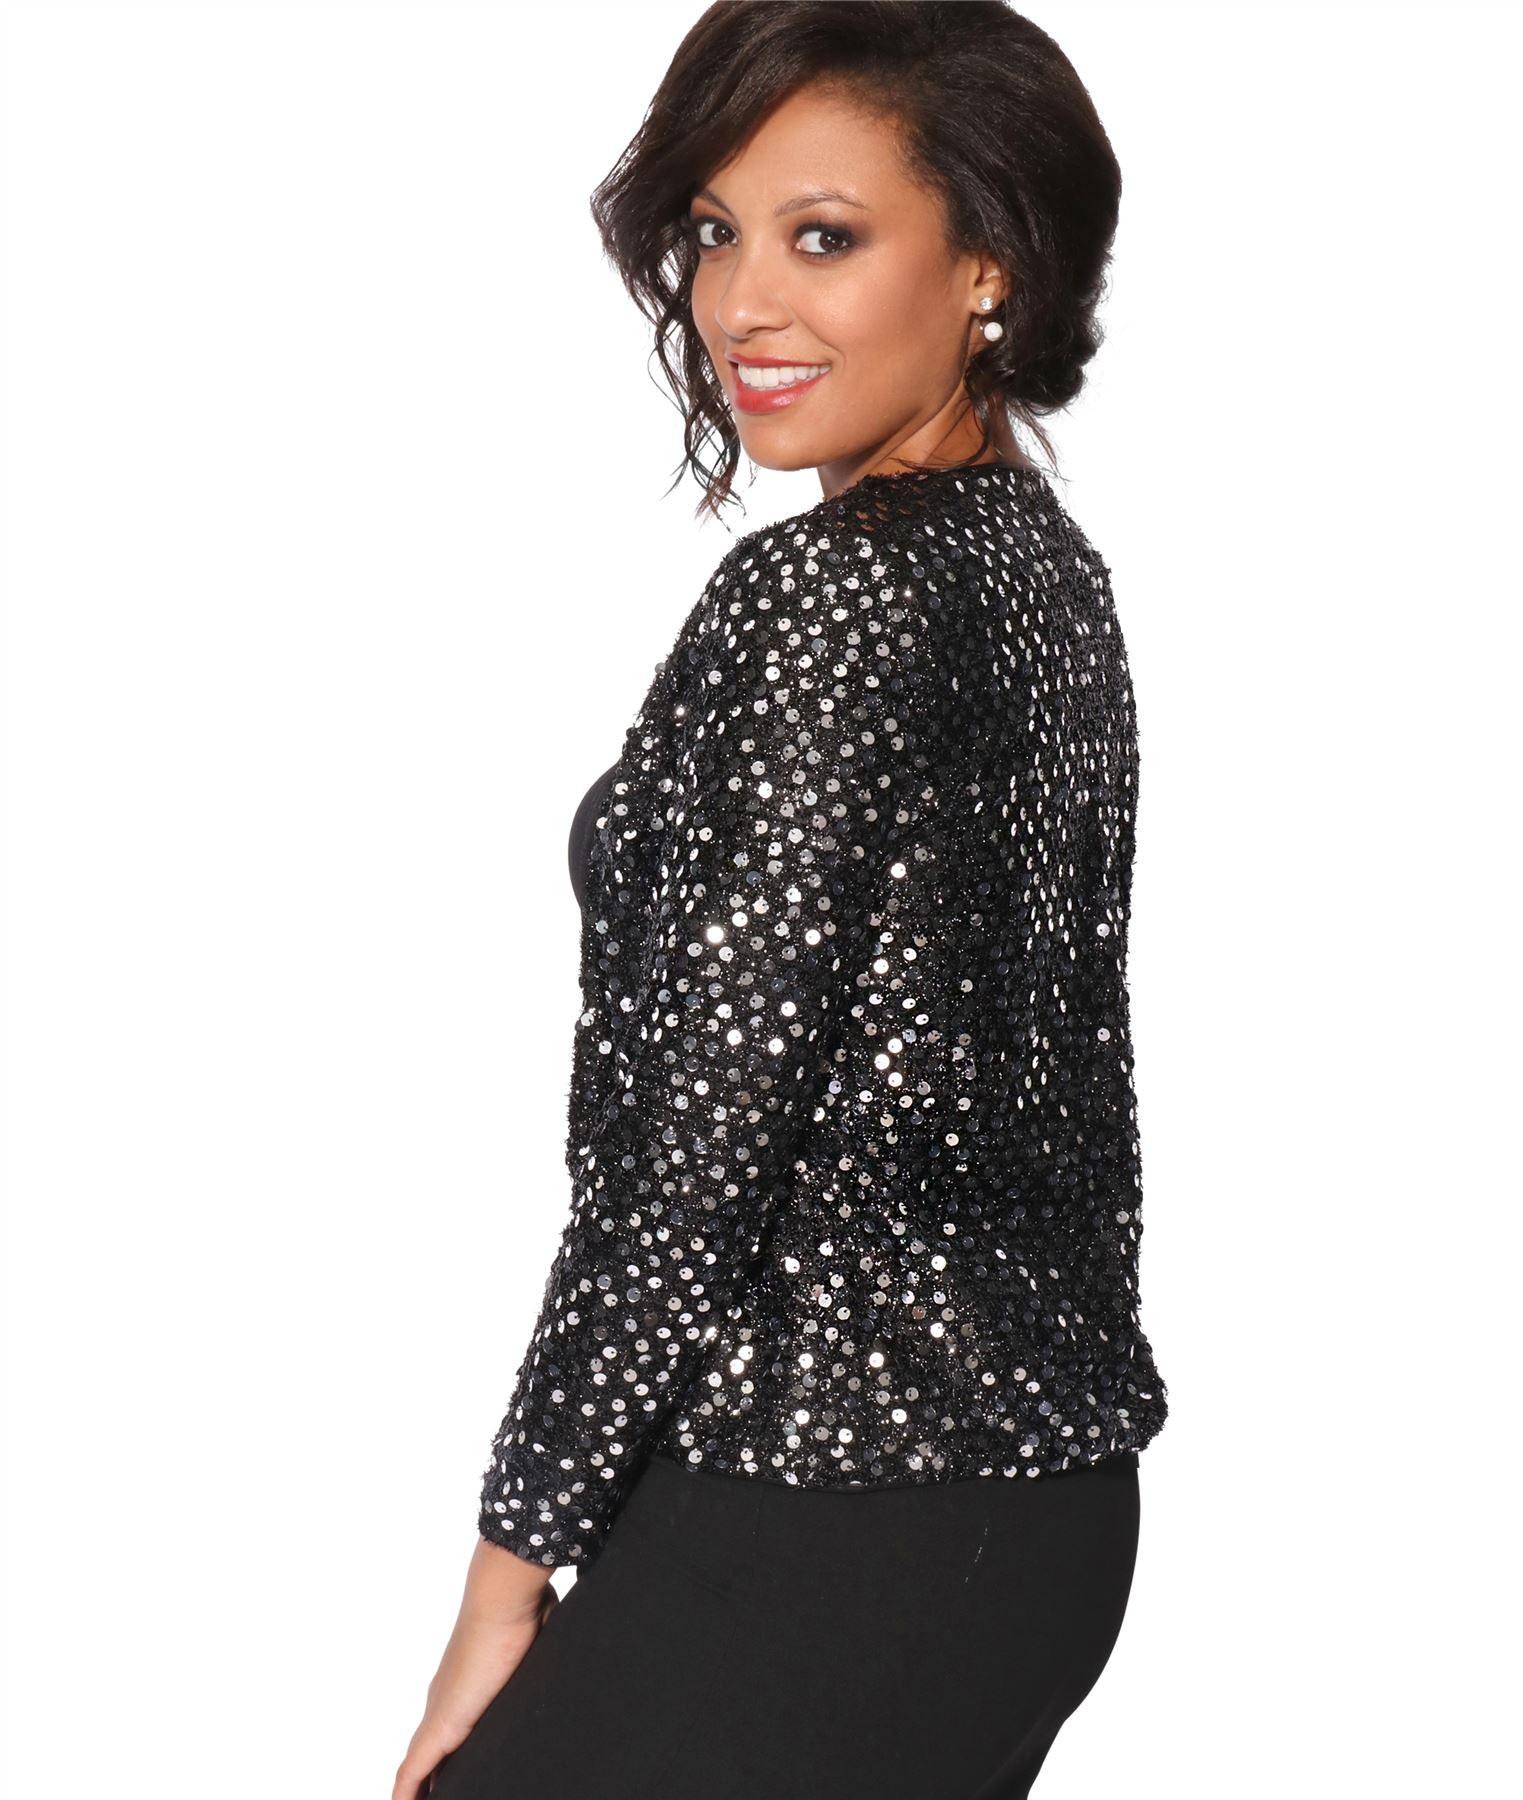 Womens-Sequin-Shrug-Bolero-Cropped-Top-Jacket-Blazer-Party-Evening-Coat thumbnail 17